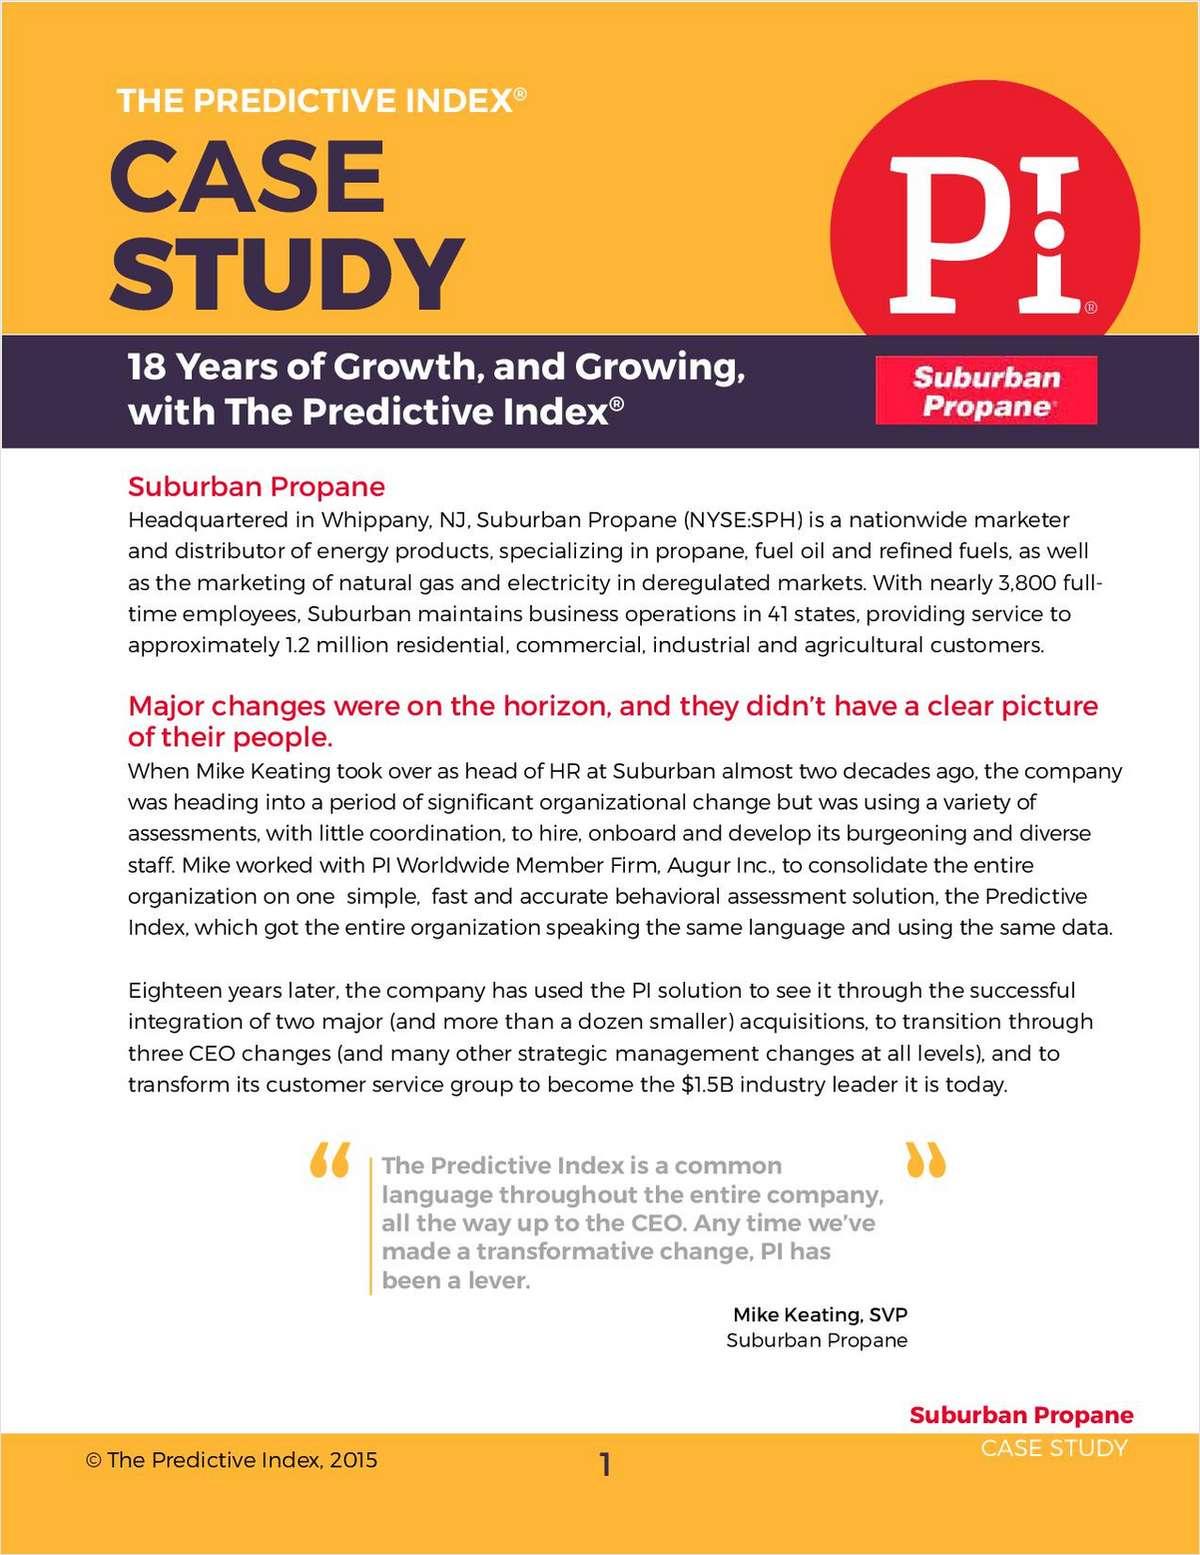 Suburban Propane Case Study